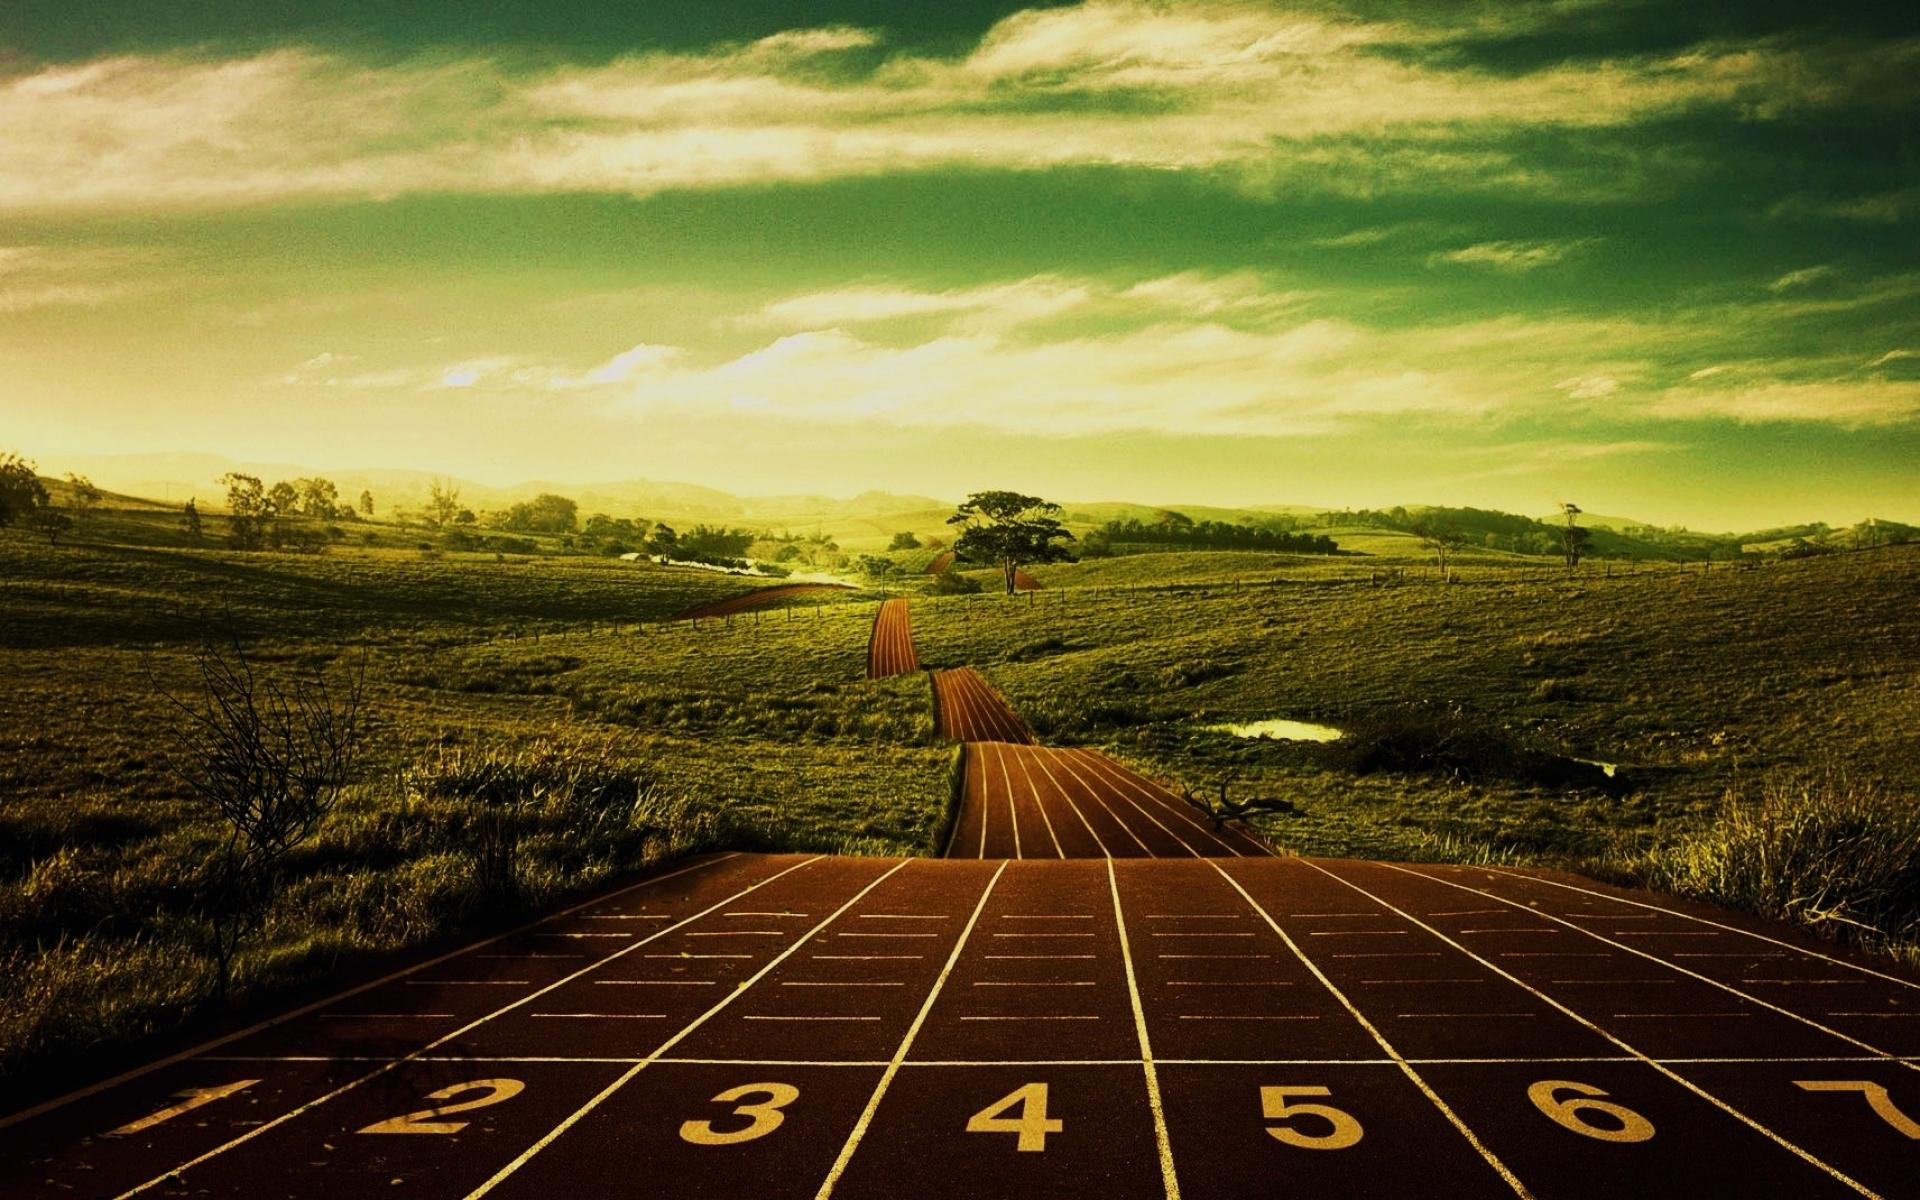 running jogging 2020x1070 wallpaper Wallpaper Wallpapers 1920x1200